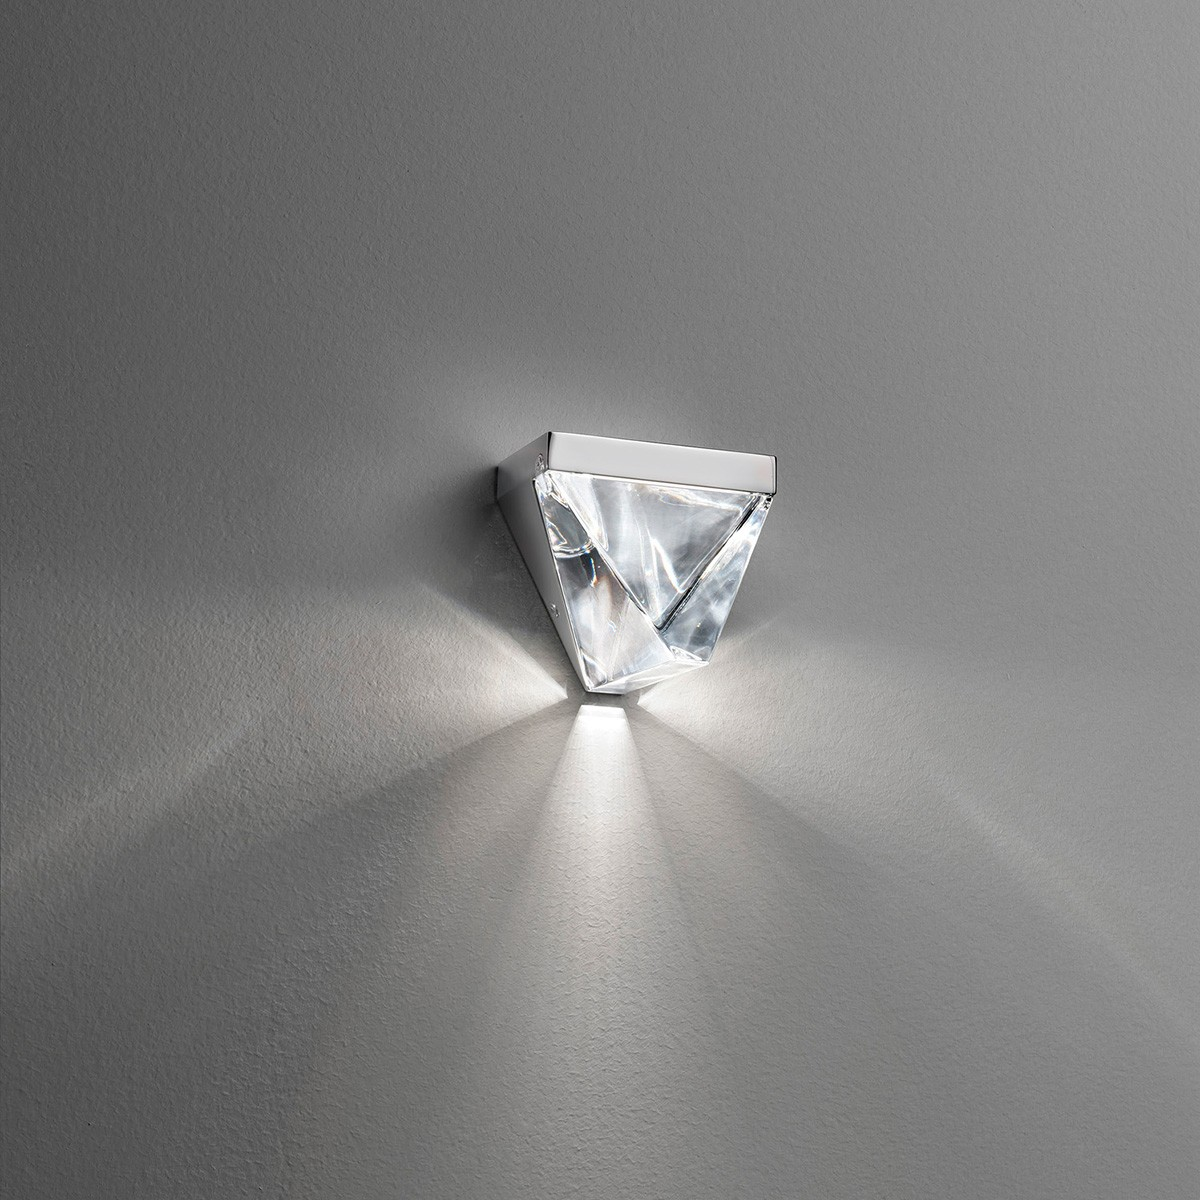 Fabbian Tripla Wandleuchte, Aluminium poliert